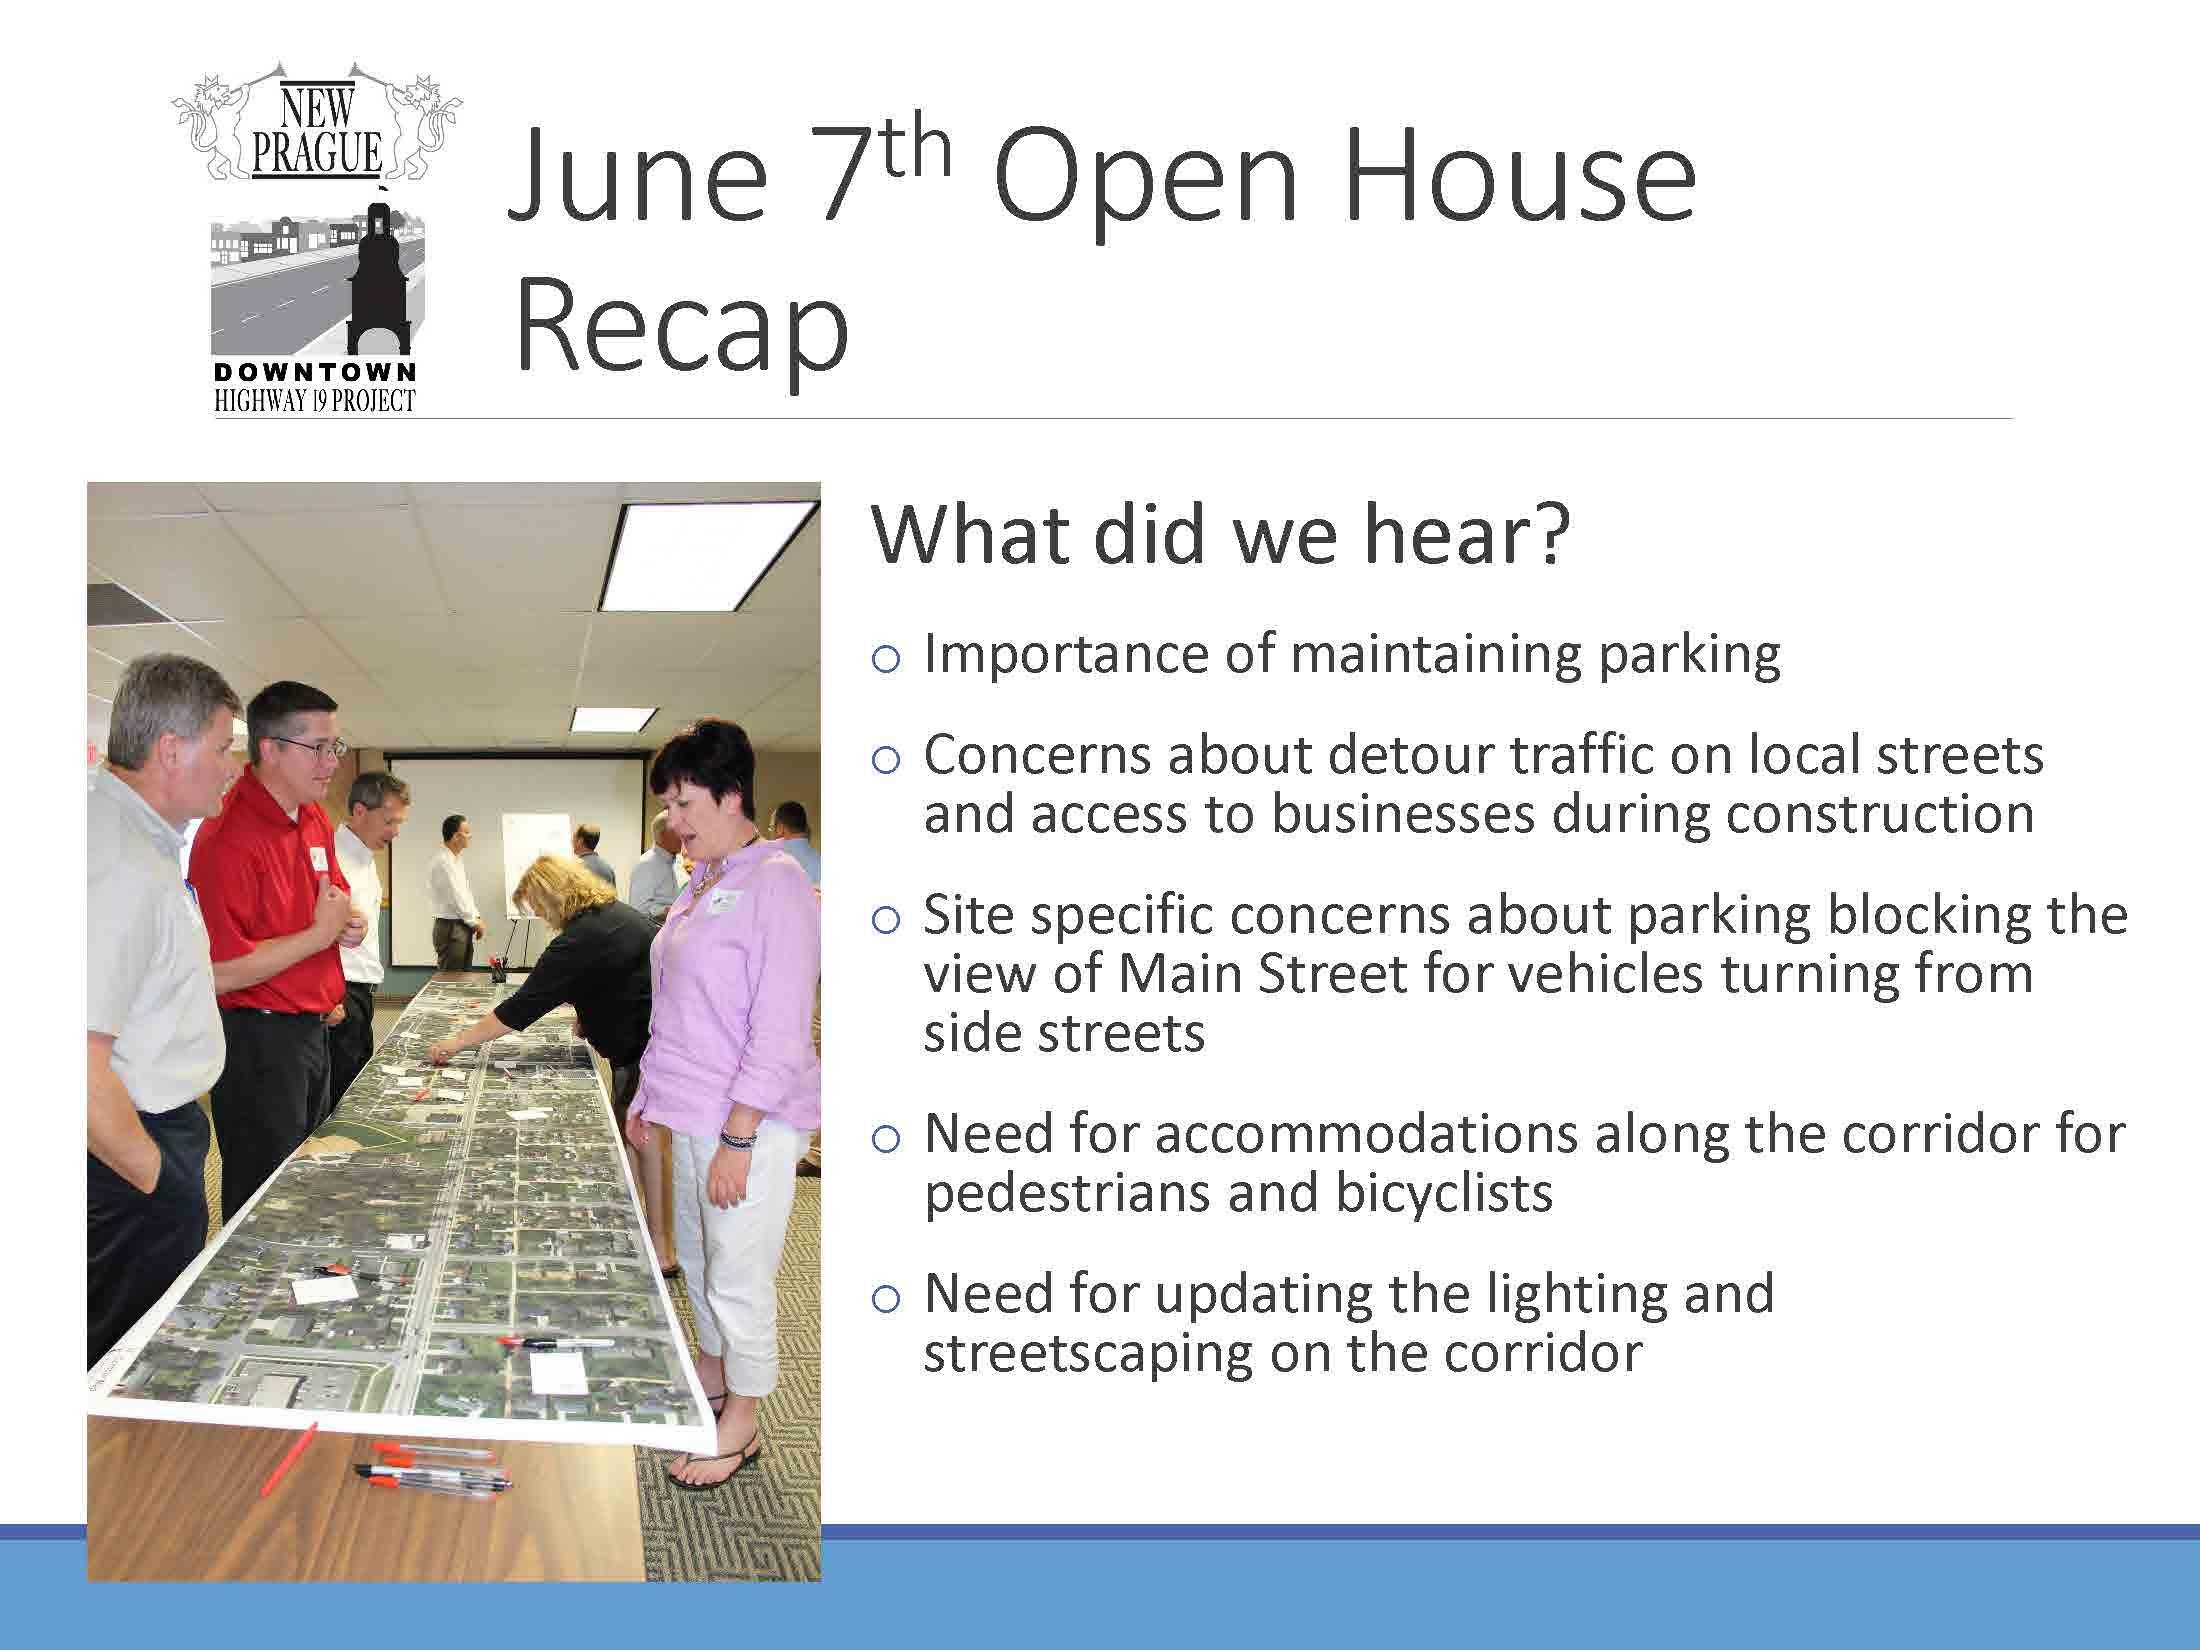 20171026_Open_House_Presentation__Page_06.jpg